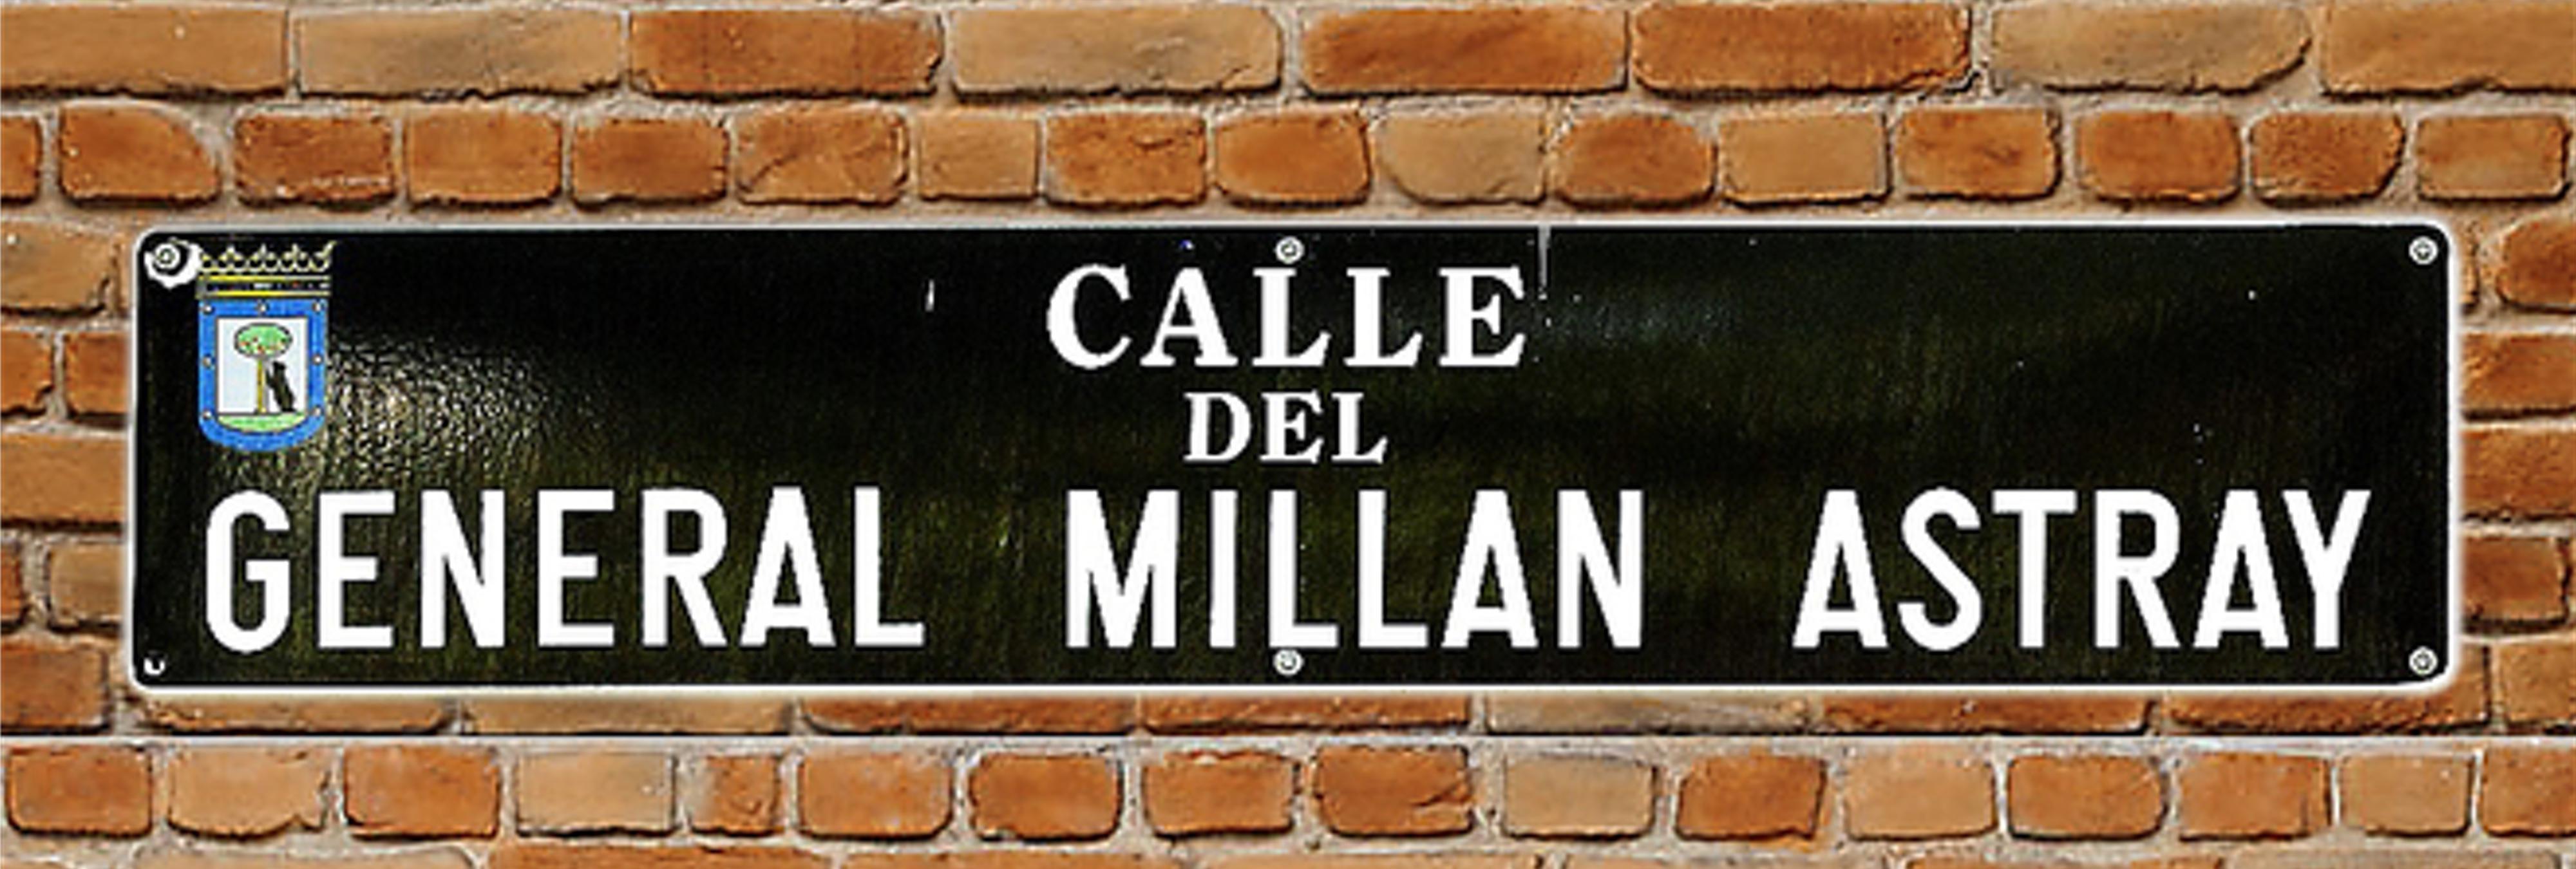 Google Maps desoye a Carmena y reincorpora la calle franquista de Millán Astray